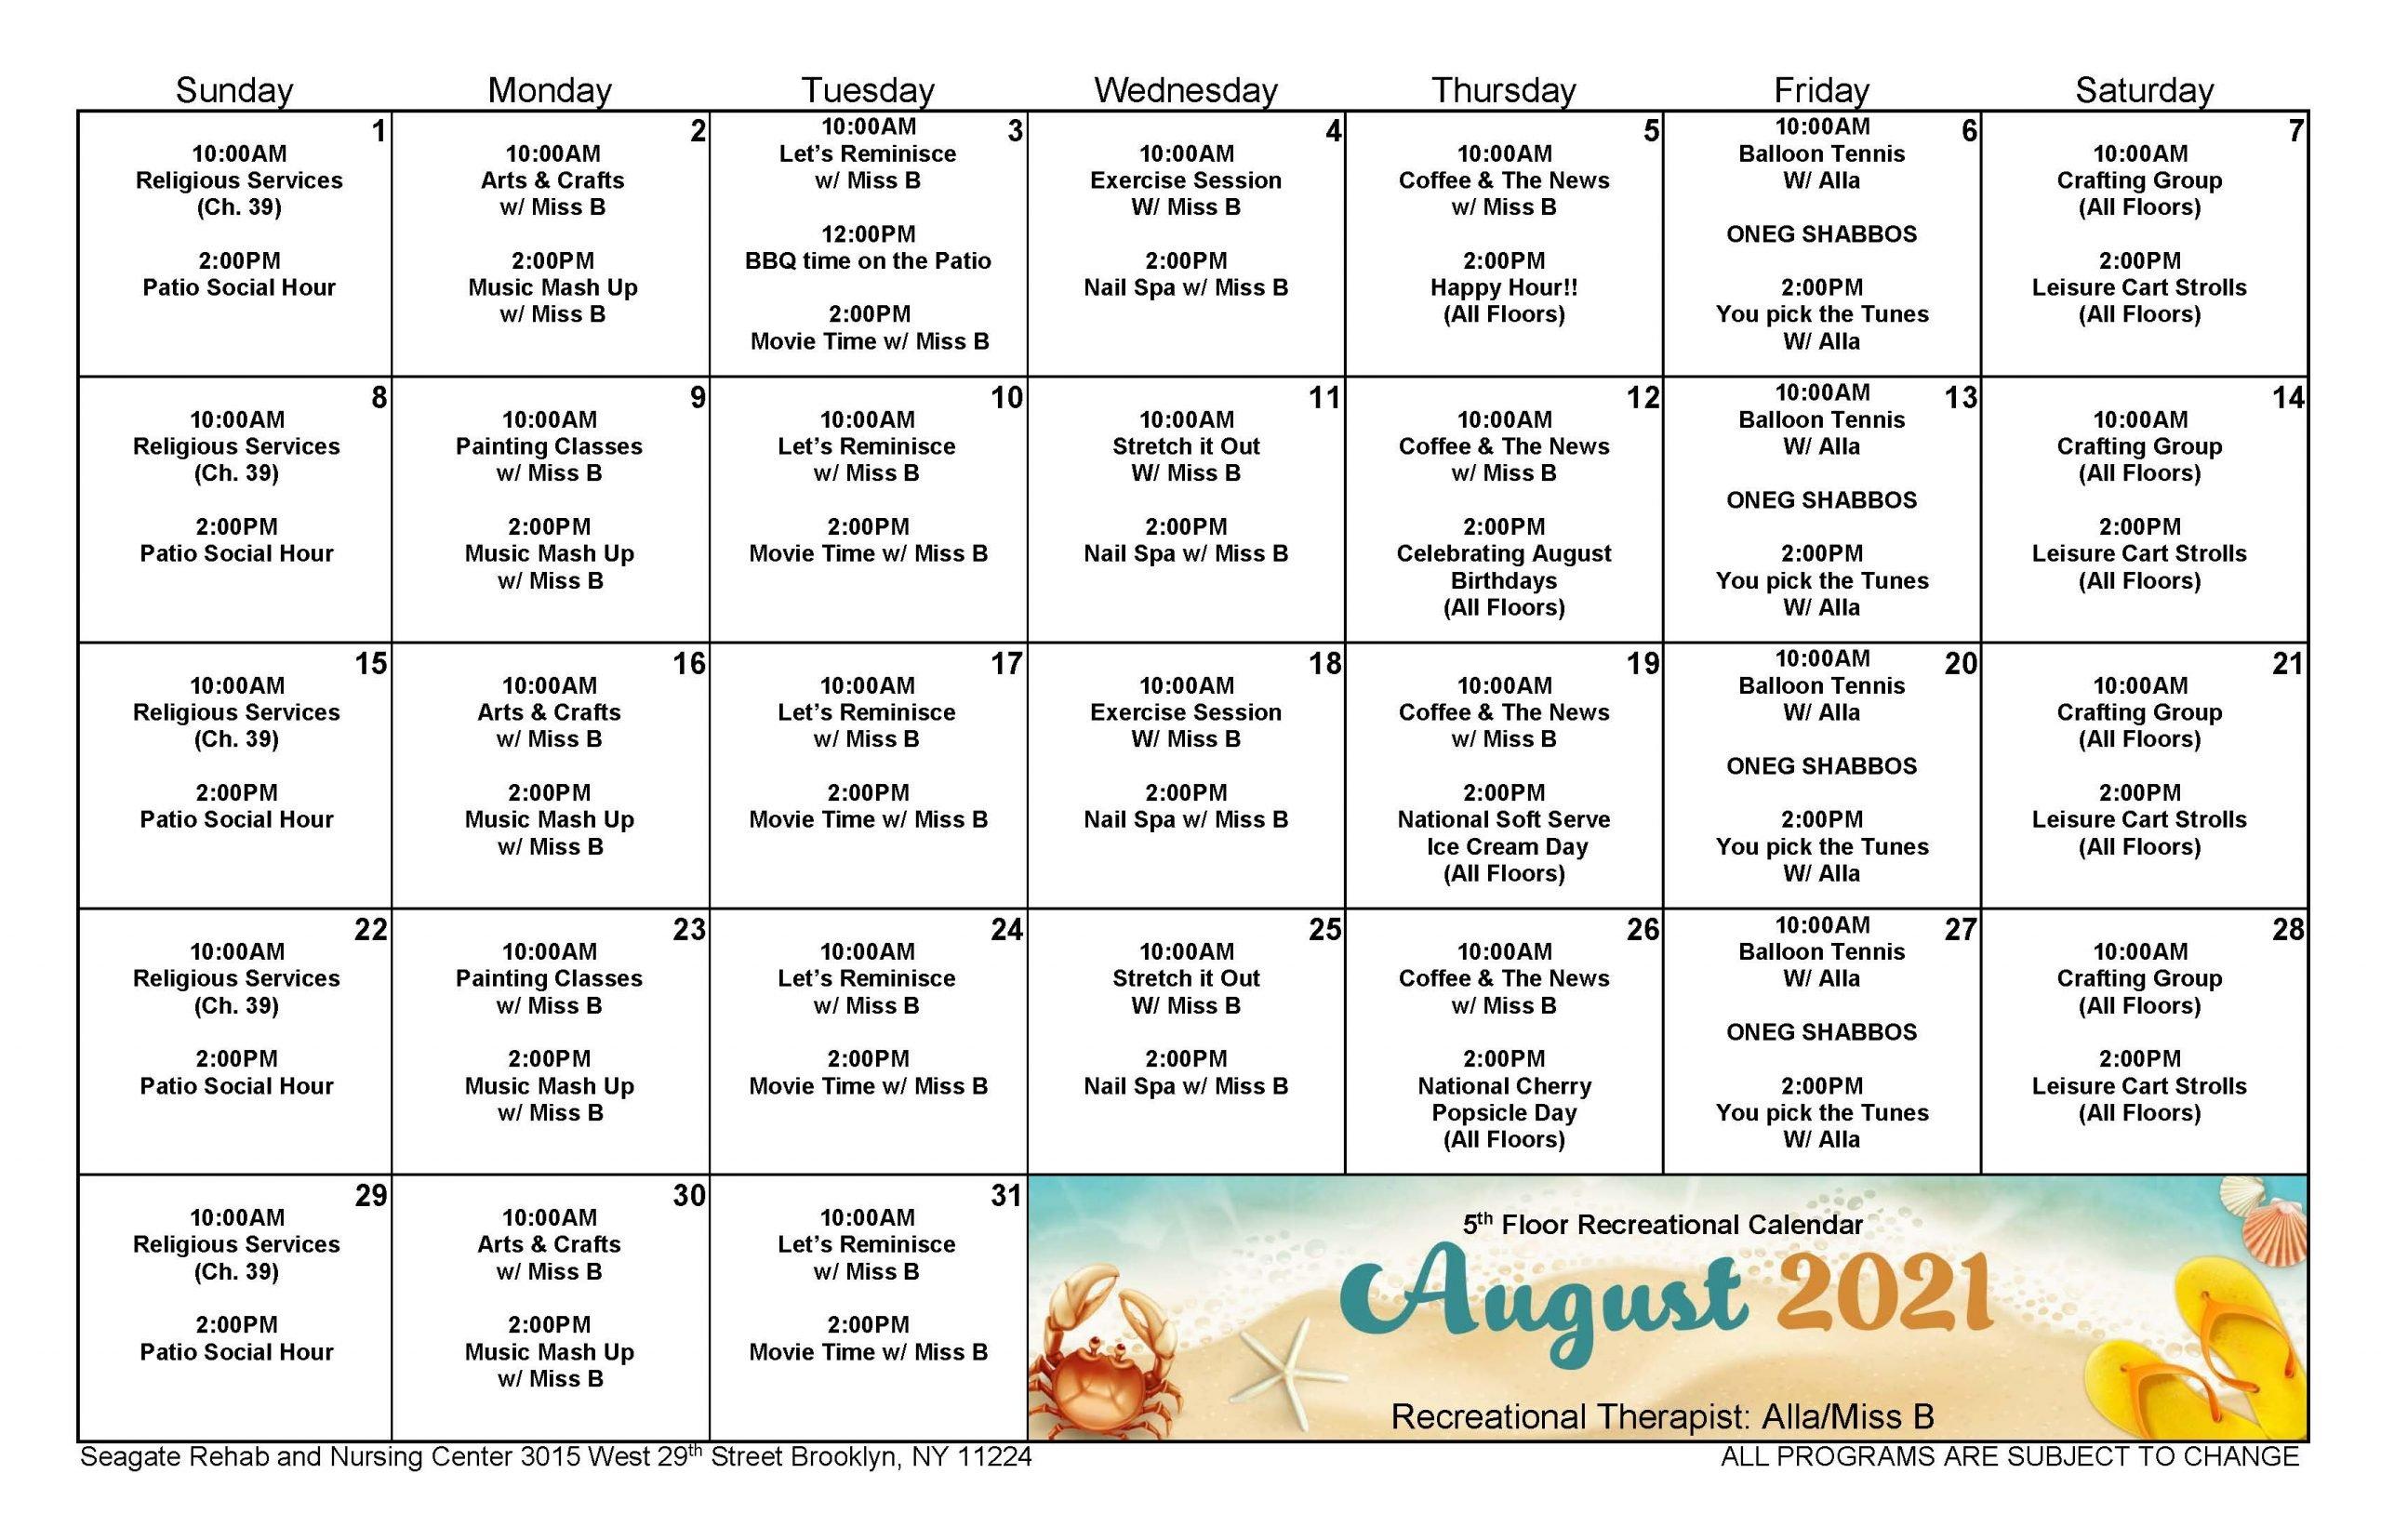 Seagate August Event Calendar for 5th Floor